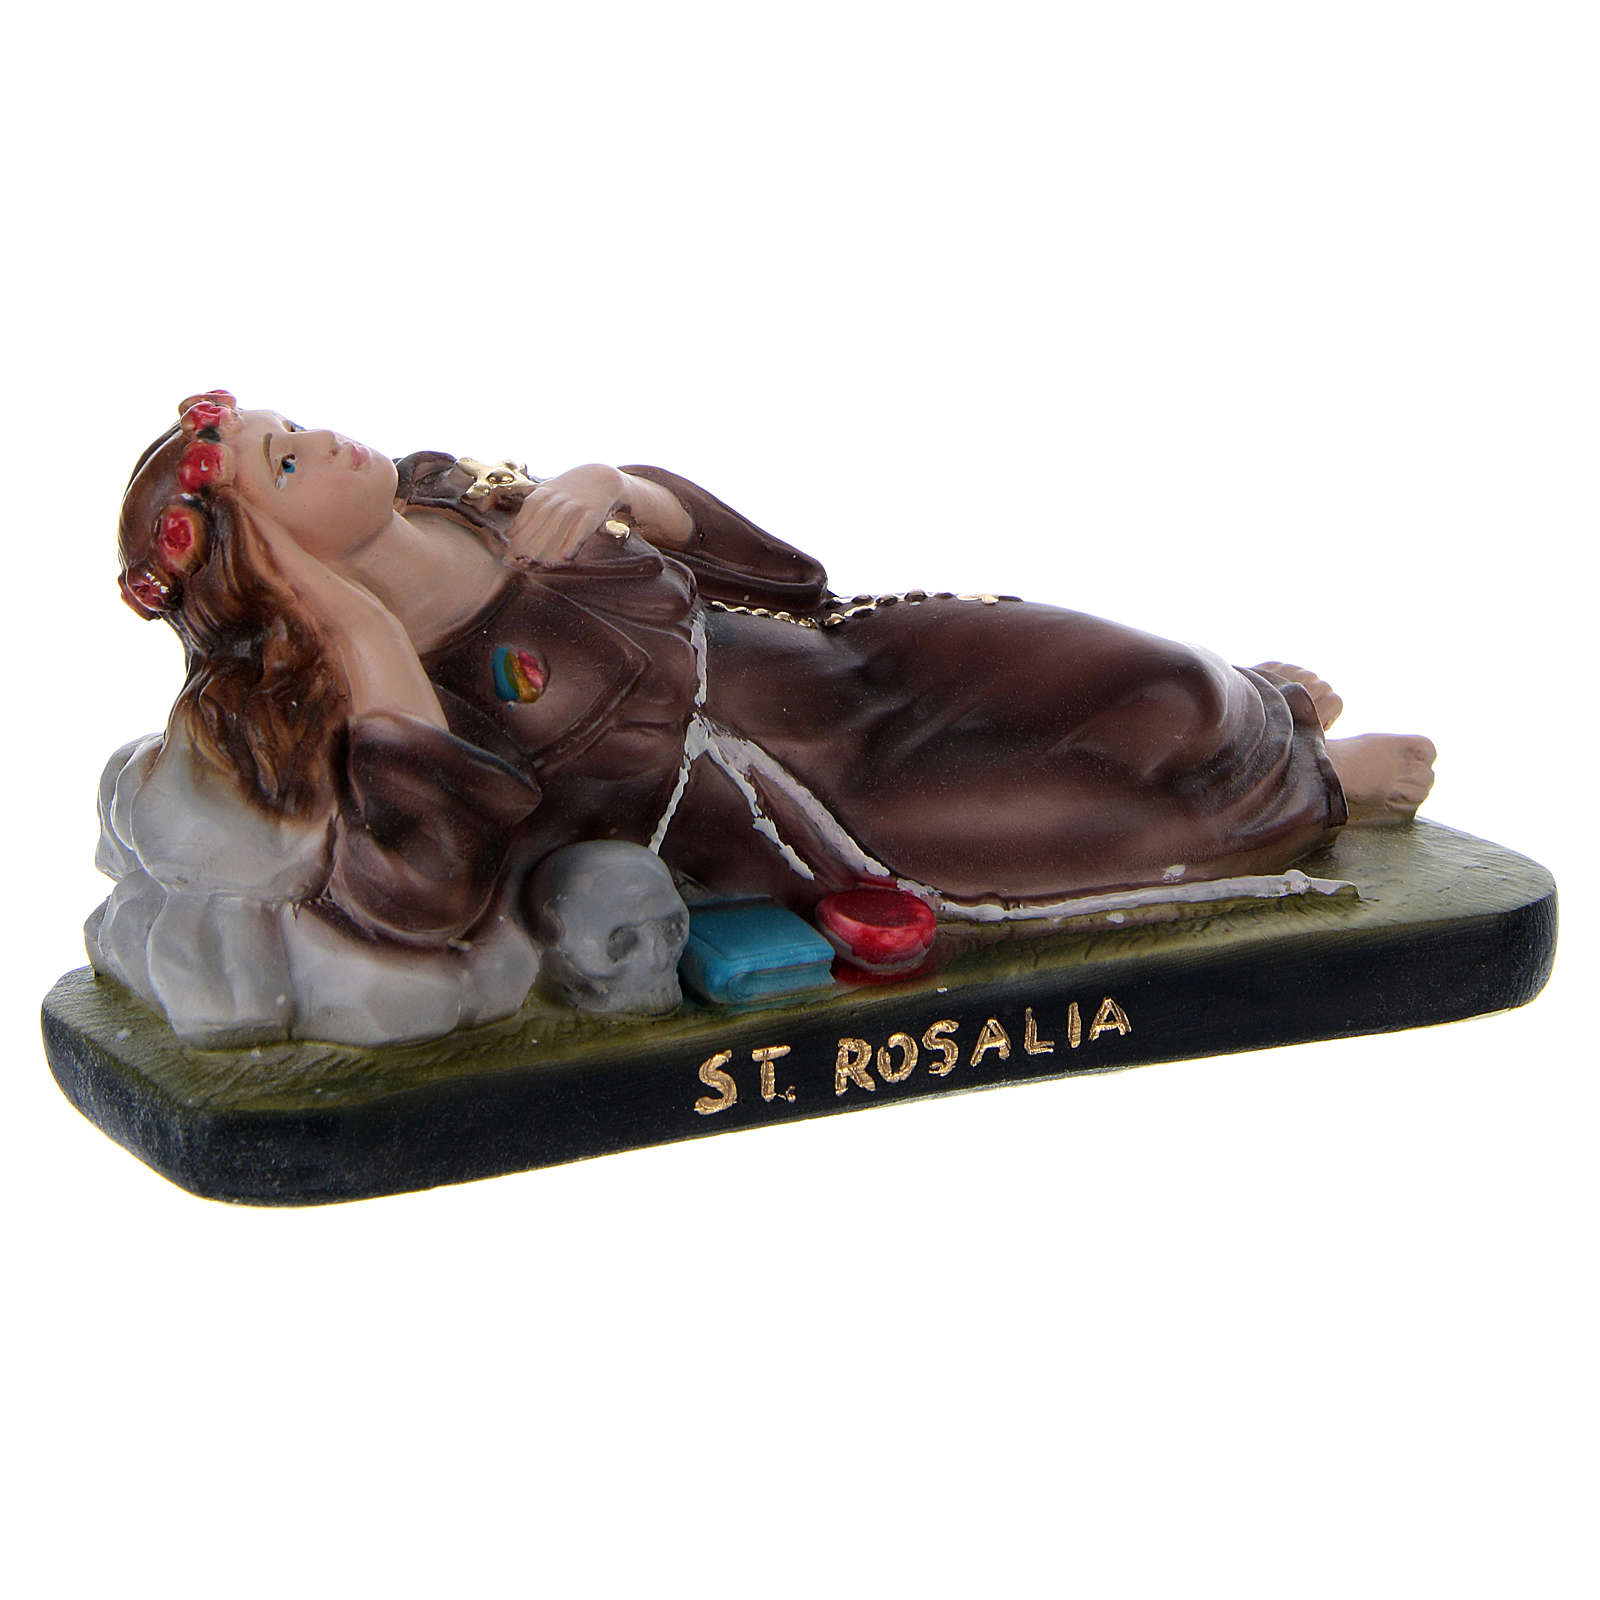 Saint Rosalia Lying Down 10x15x5 cm in plaster 4